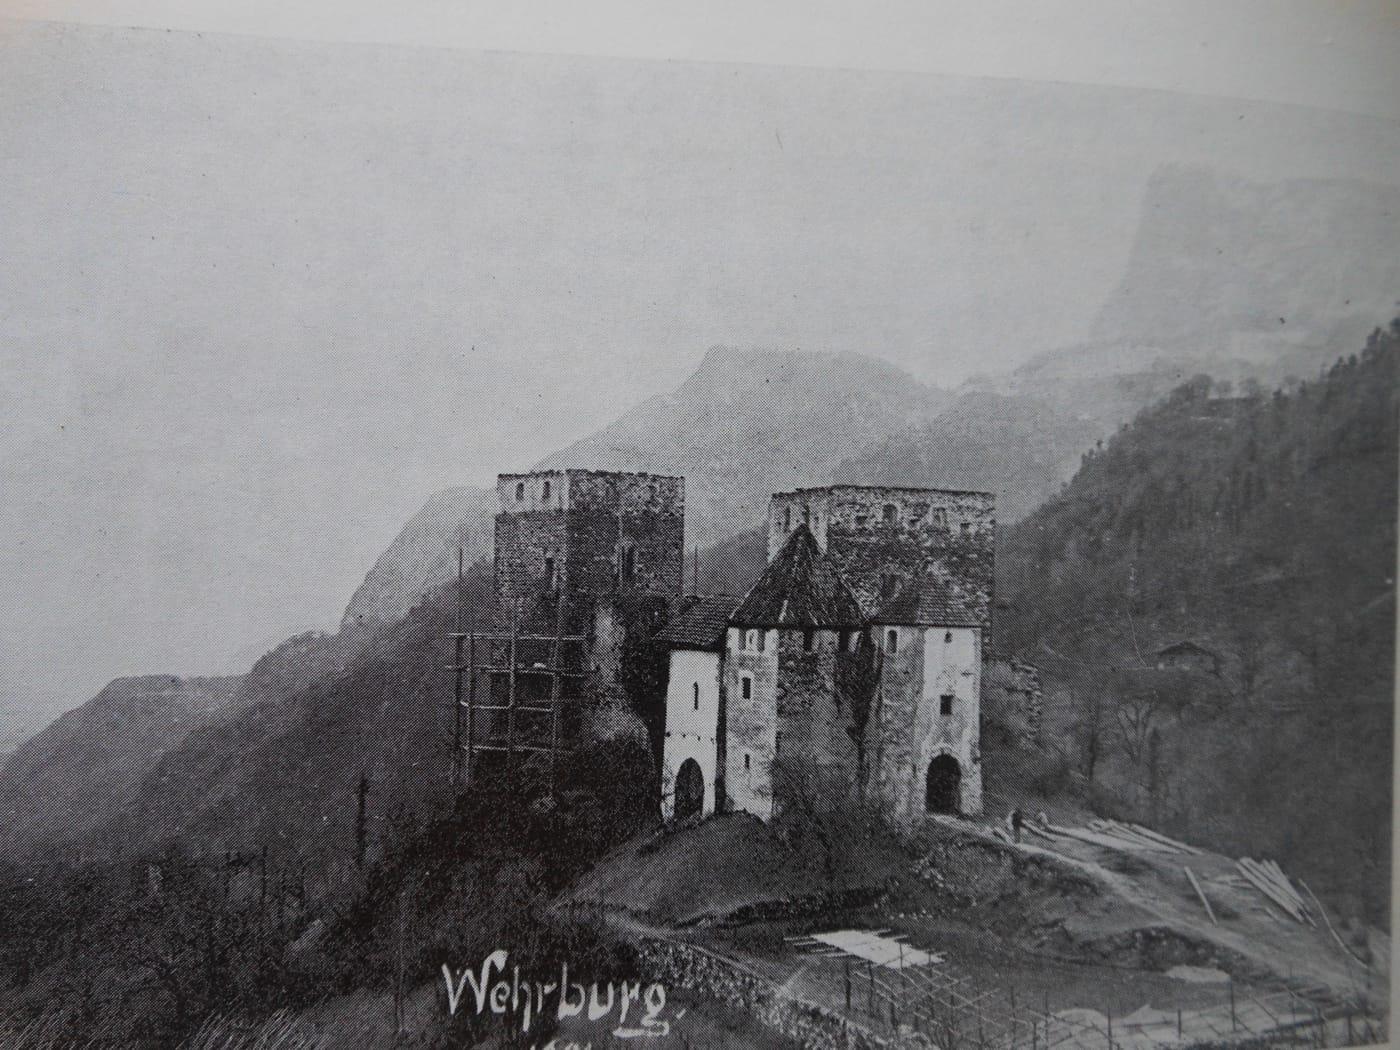 Wehrburg in de steigers, rond 1898